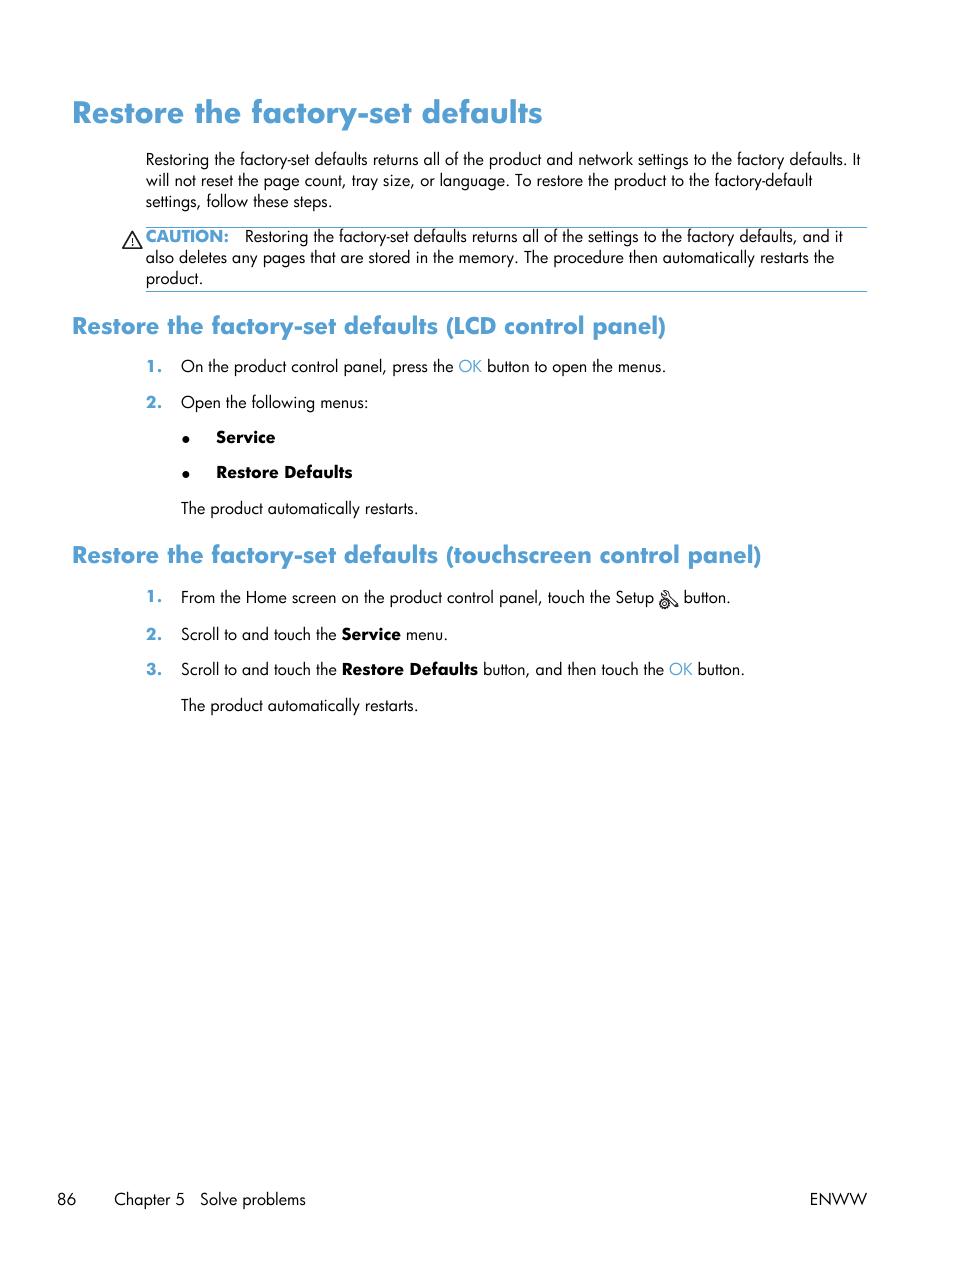 Restore the factory-set defaults   HP LaserJet Pro 400 Printer M401 series  User Manual